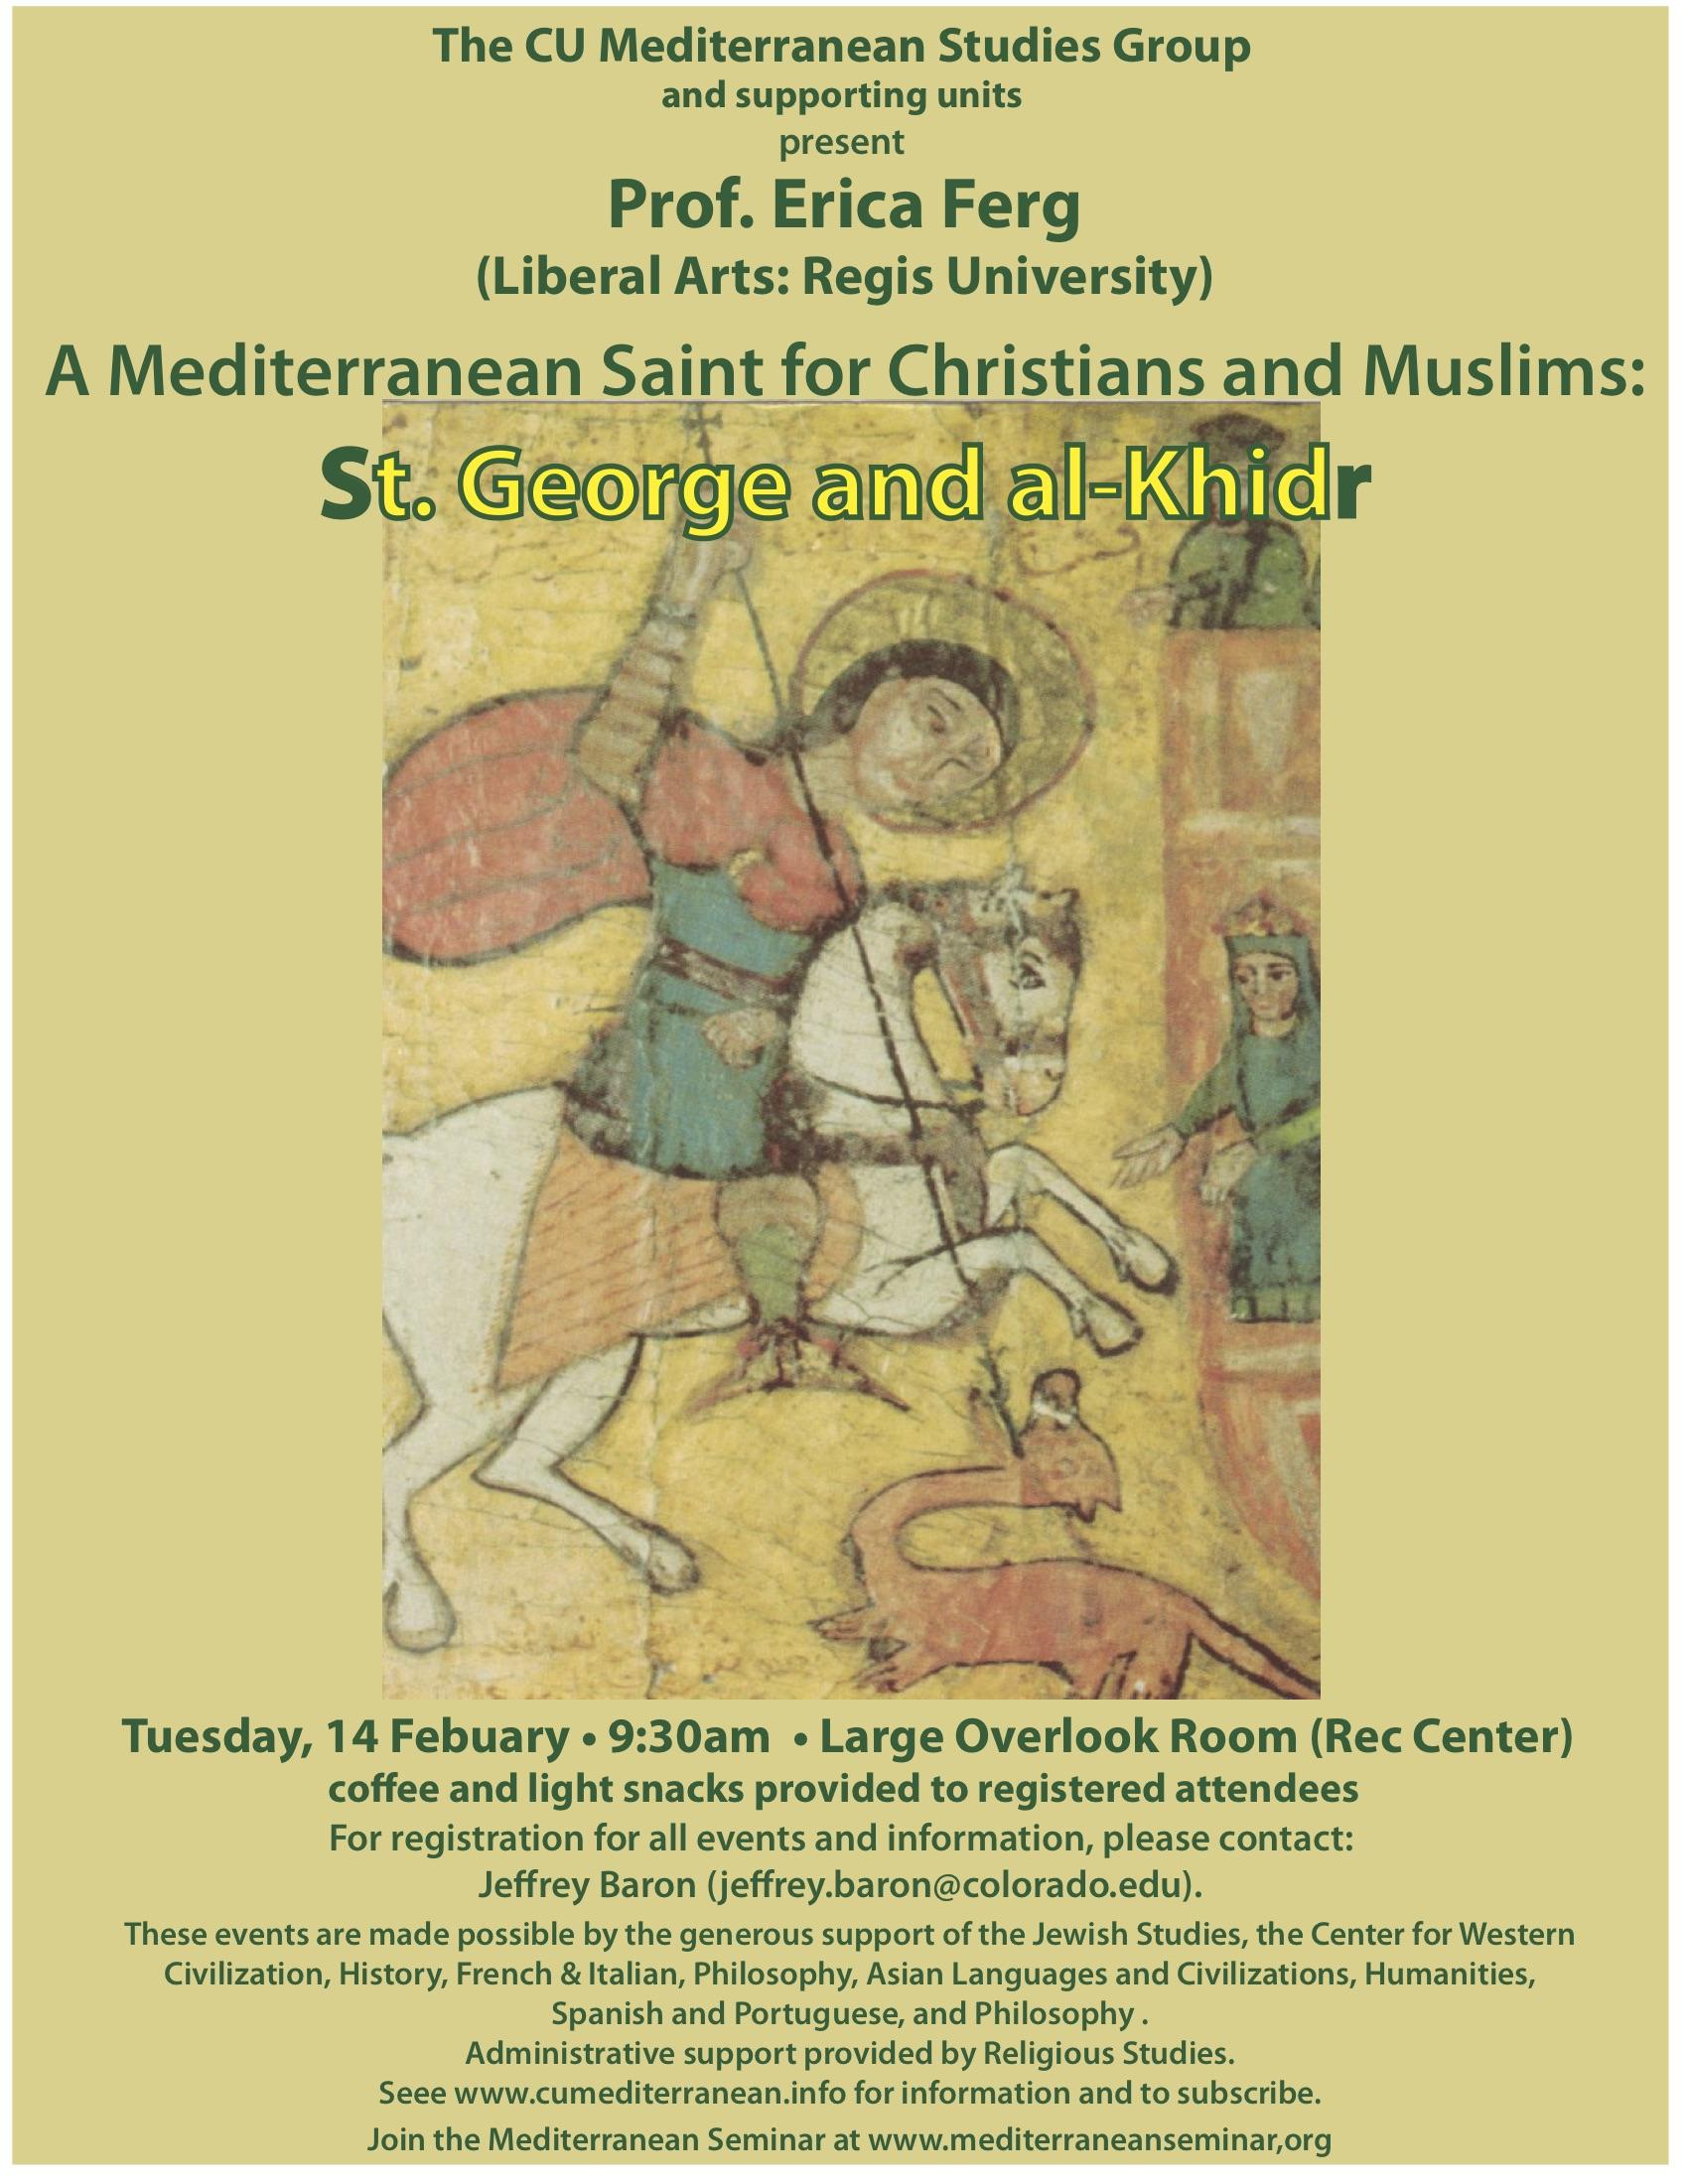 CU Mediterranean Studies Group — The Mediterranean Seminar